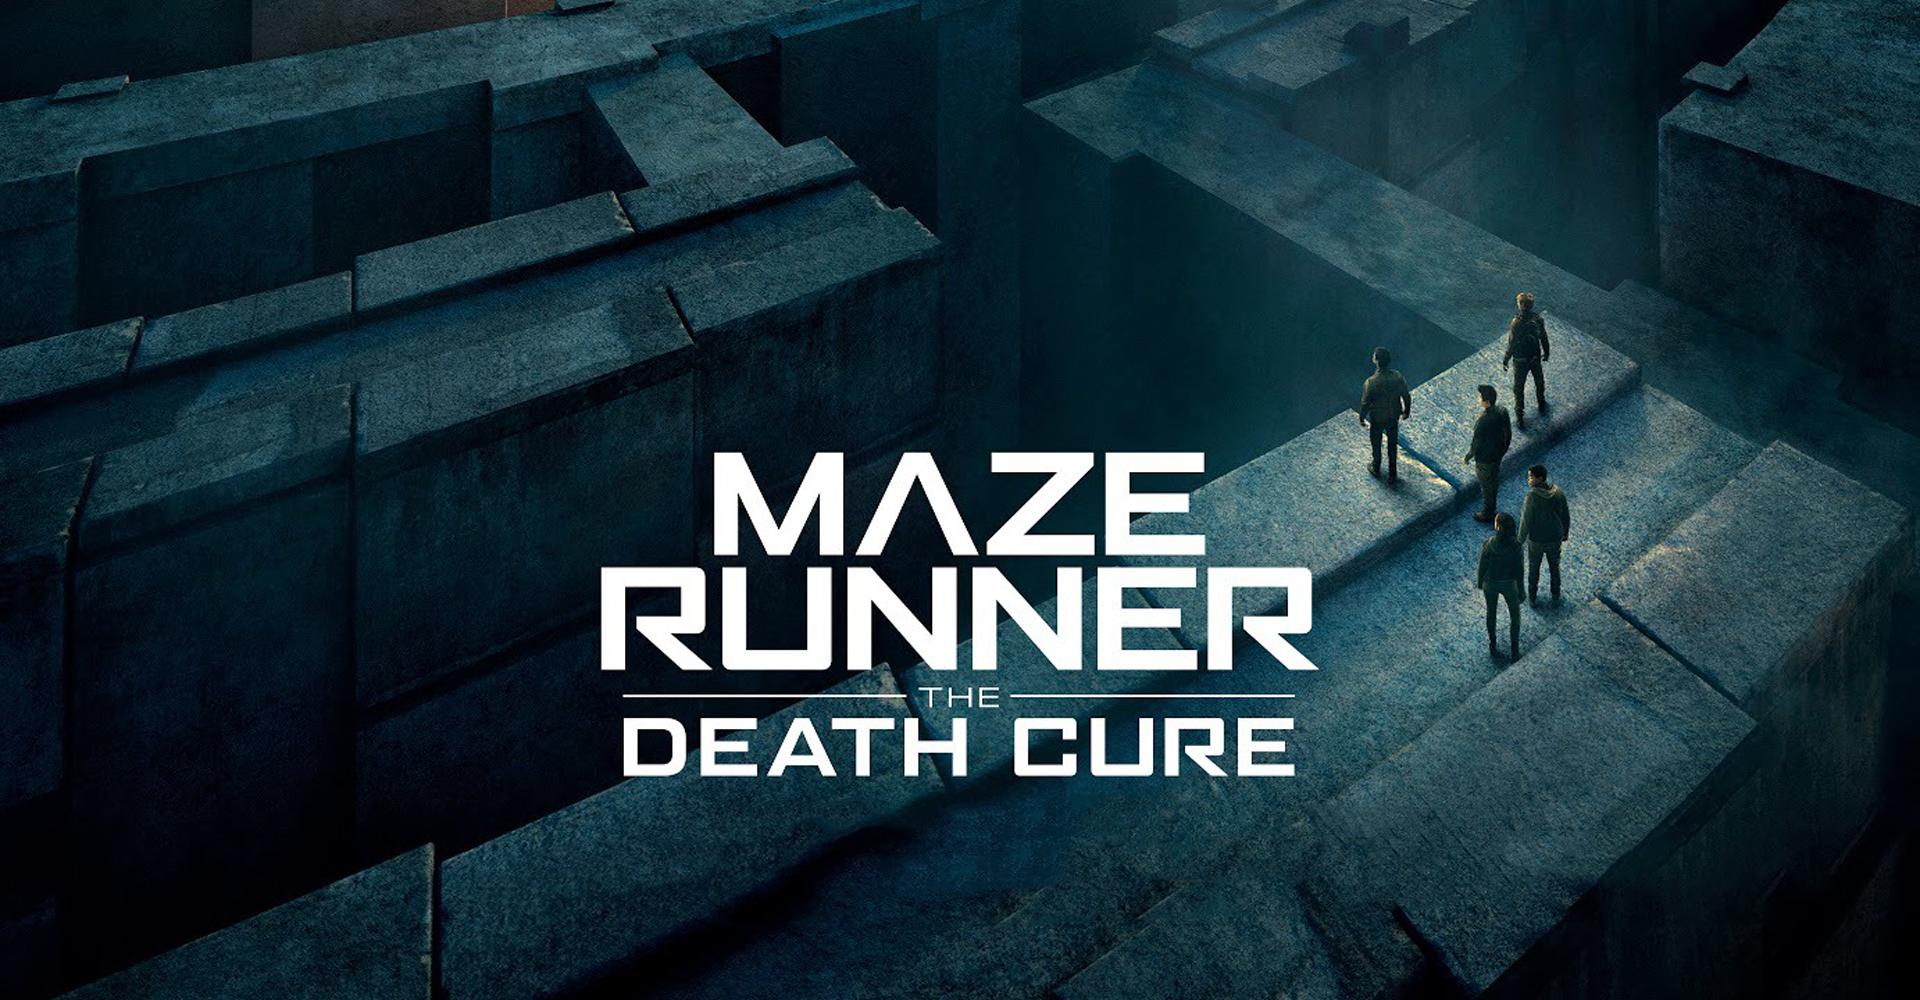 3d Wallpaper Hd Universe 2932x2932 Maze Runner The Death Cure 2018 Ipad Pro Retina